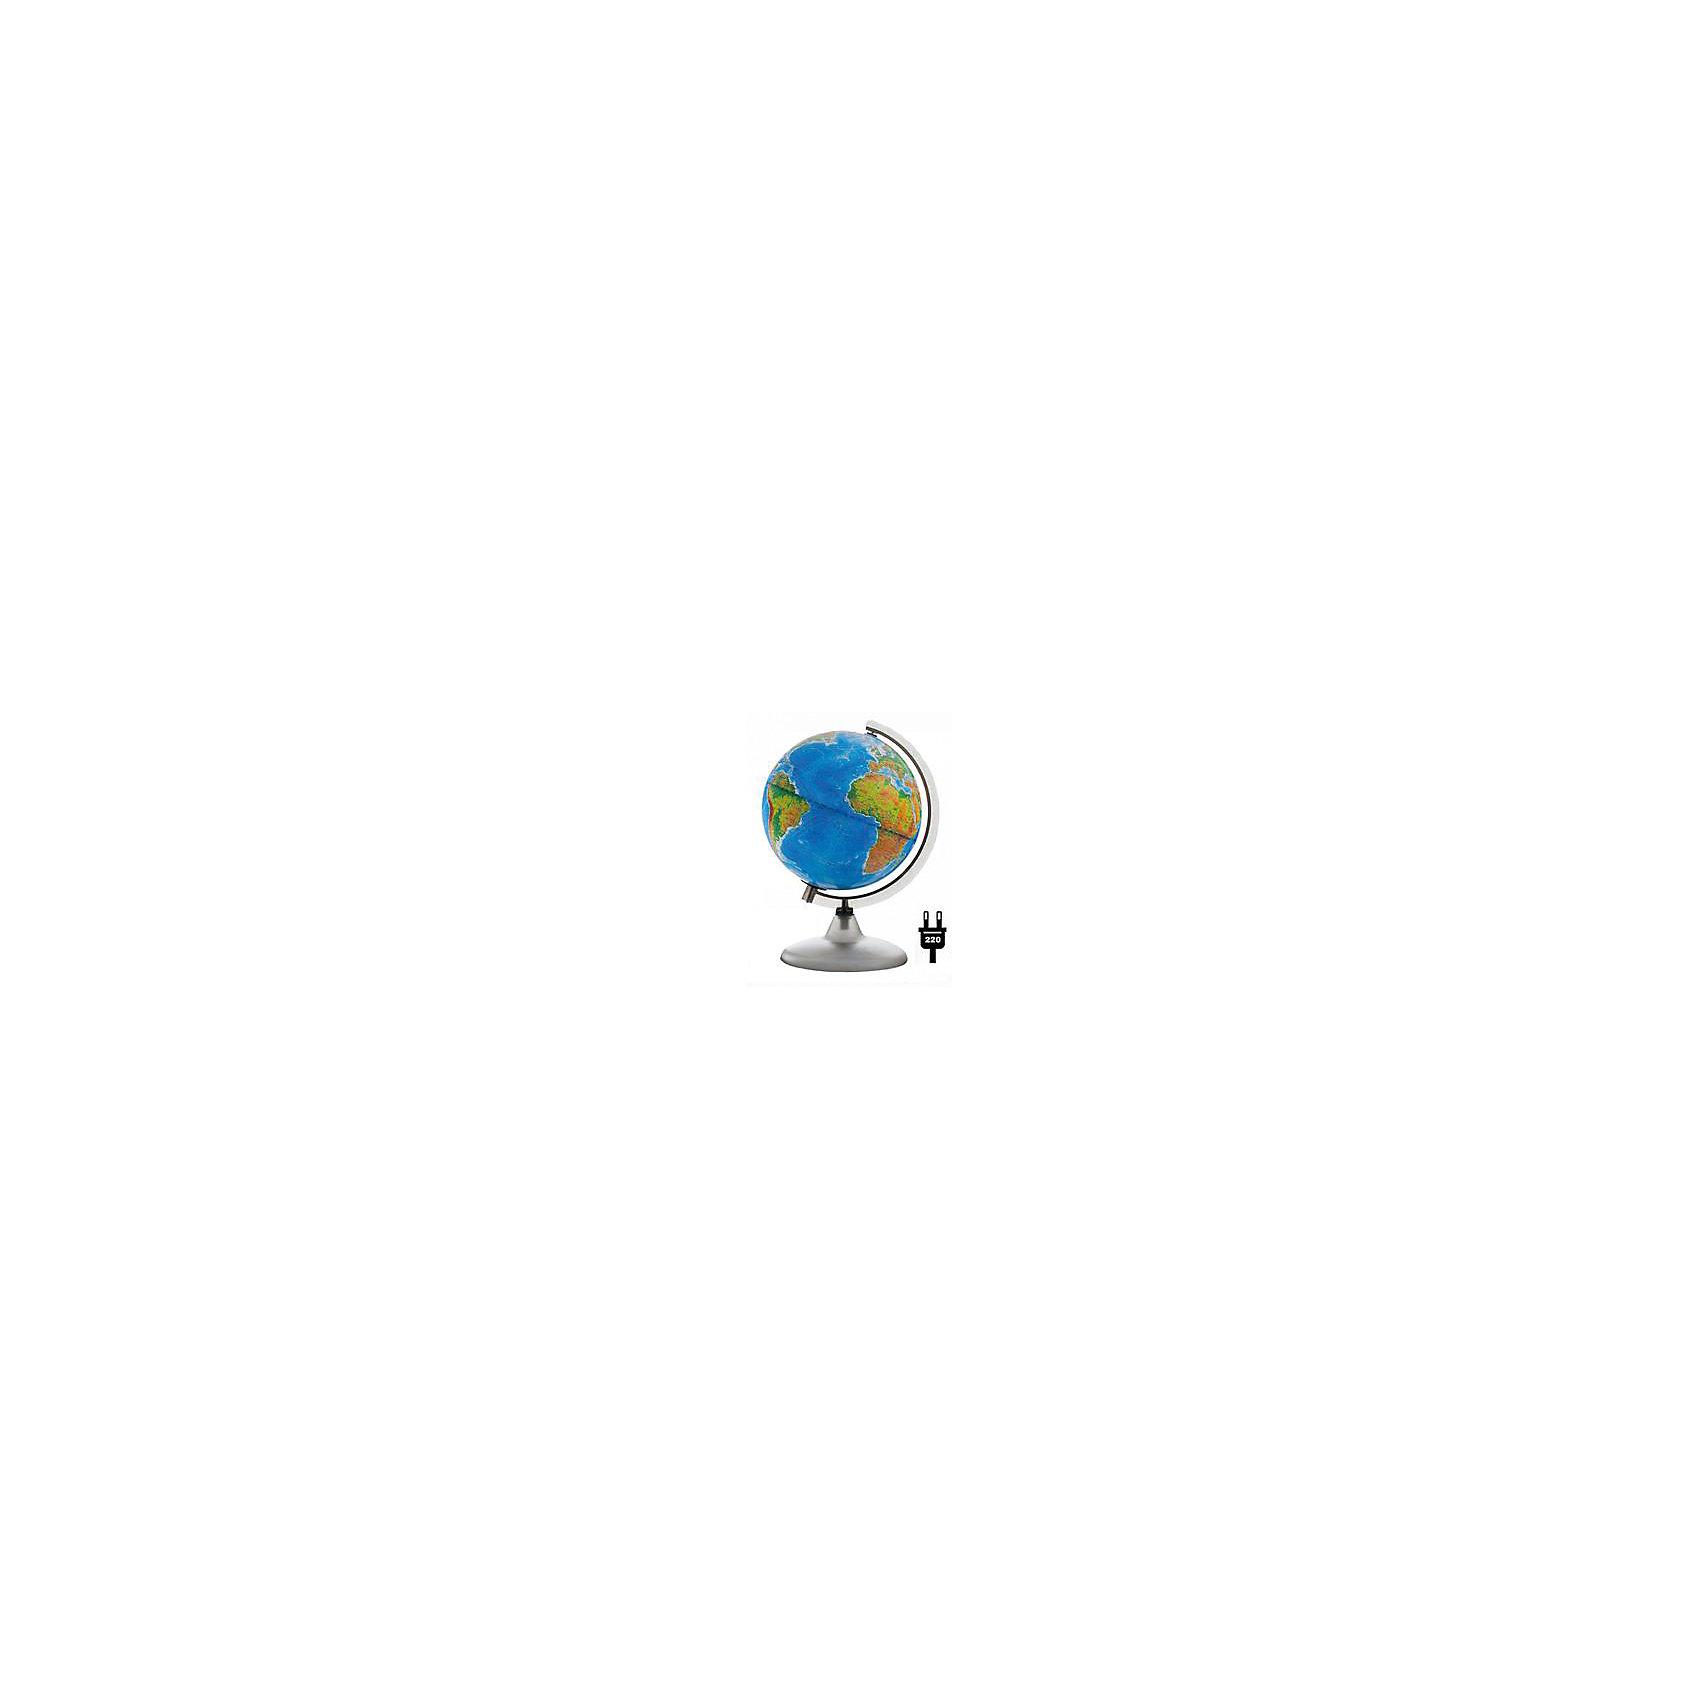 Глобус Земли «Двойная карта» с подсветкой, диаметр 210 ммДиаметр: 210 мм<br><br>Масштаб: 1:60000000<br><br>Материал подставки: Дерево<br><br>Цвет подставки: Вишня, Орех.<br><br>Ширина мм: 217<br>Глубина мм: 217<br>Высота мм: 300<br>Вес г: 800<br>Возраст от месяцев: 72<br>Возраст до месяцев: 2147483647<br>Пол: Унисекс<br>Возраст: Детский<br>SKU: 5518225